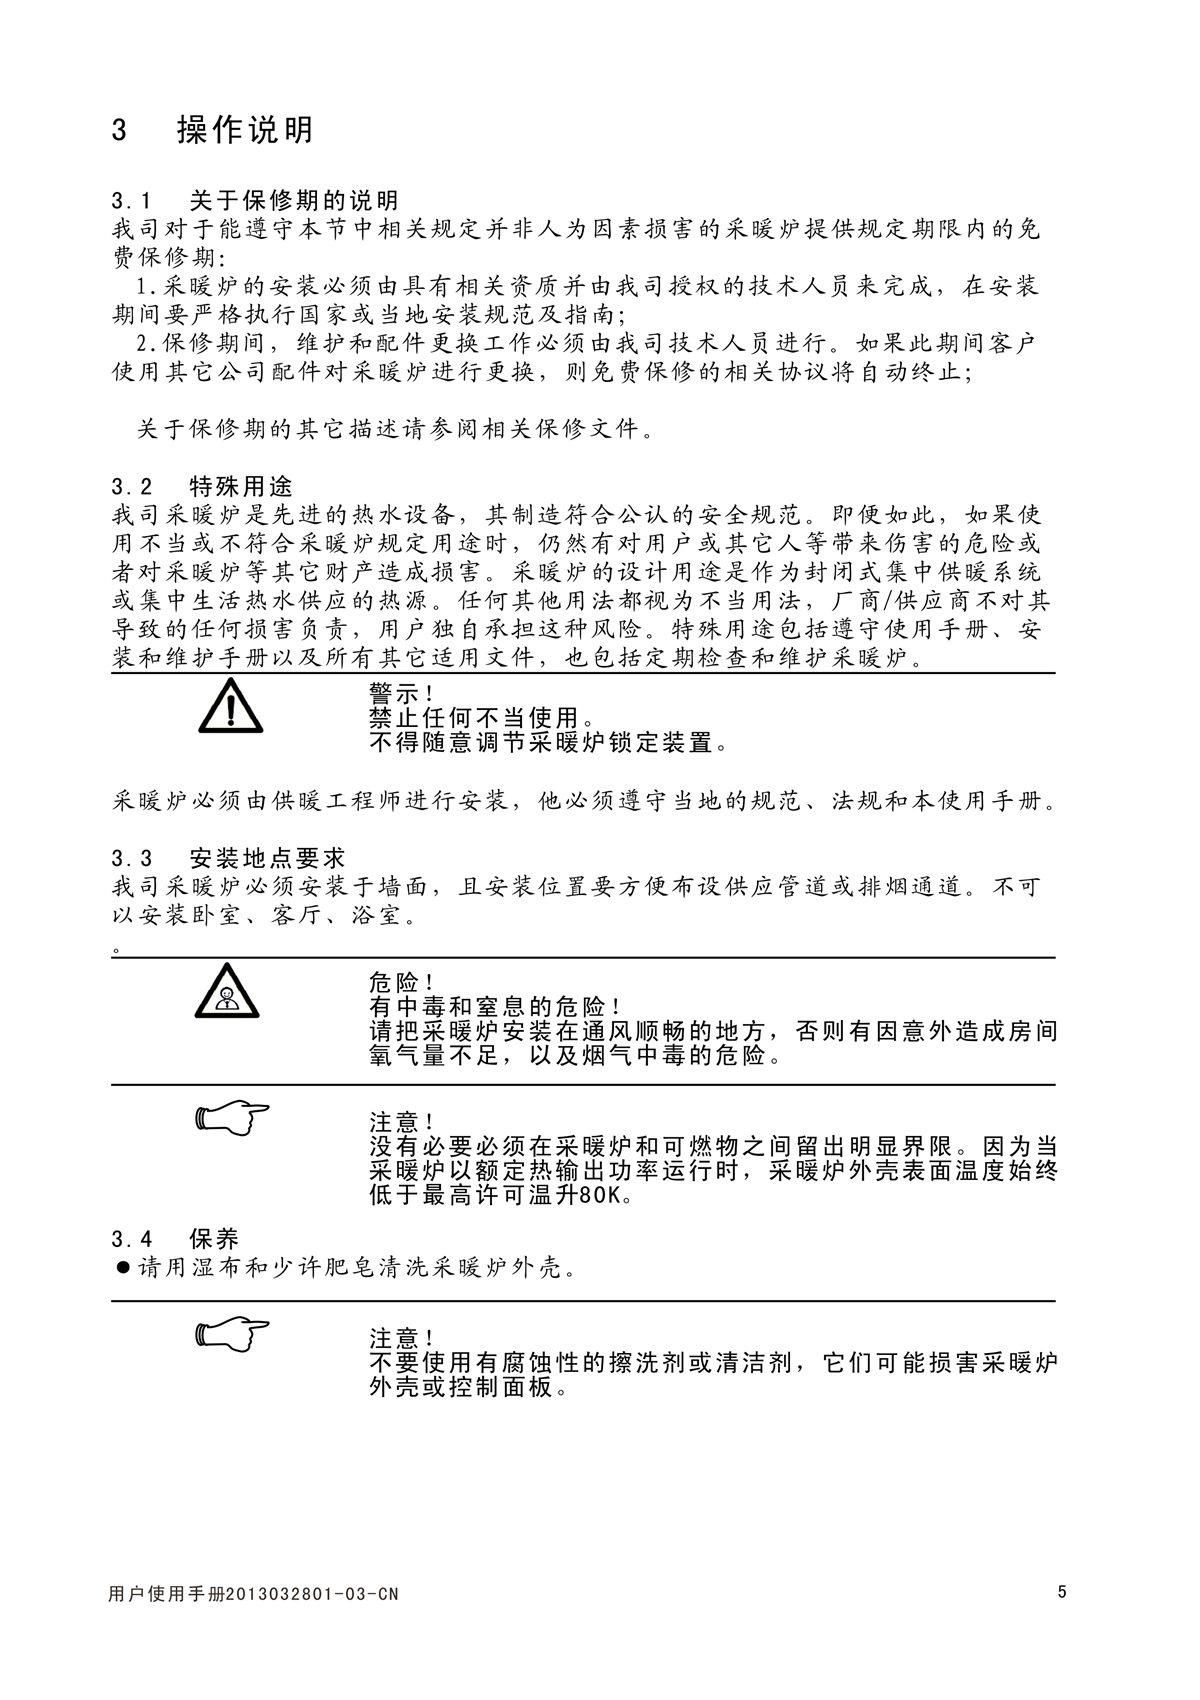 ES16A系列-用户使用手册-6_02.jpg